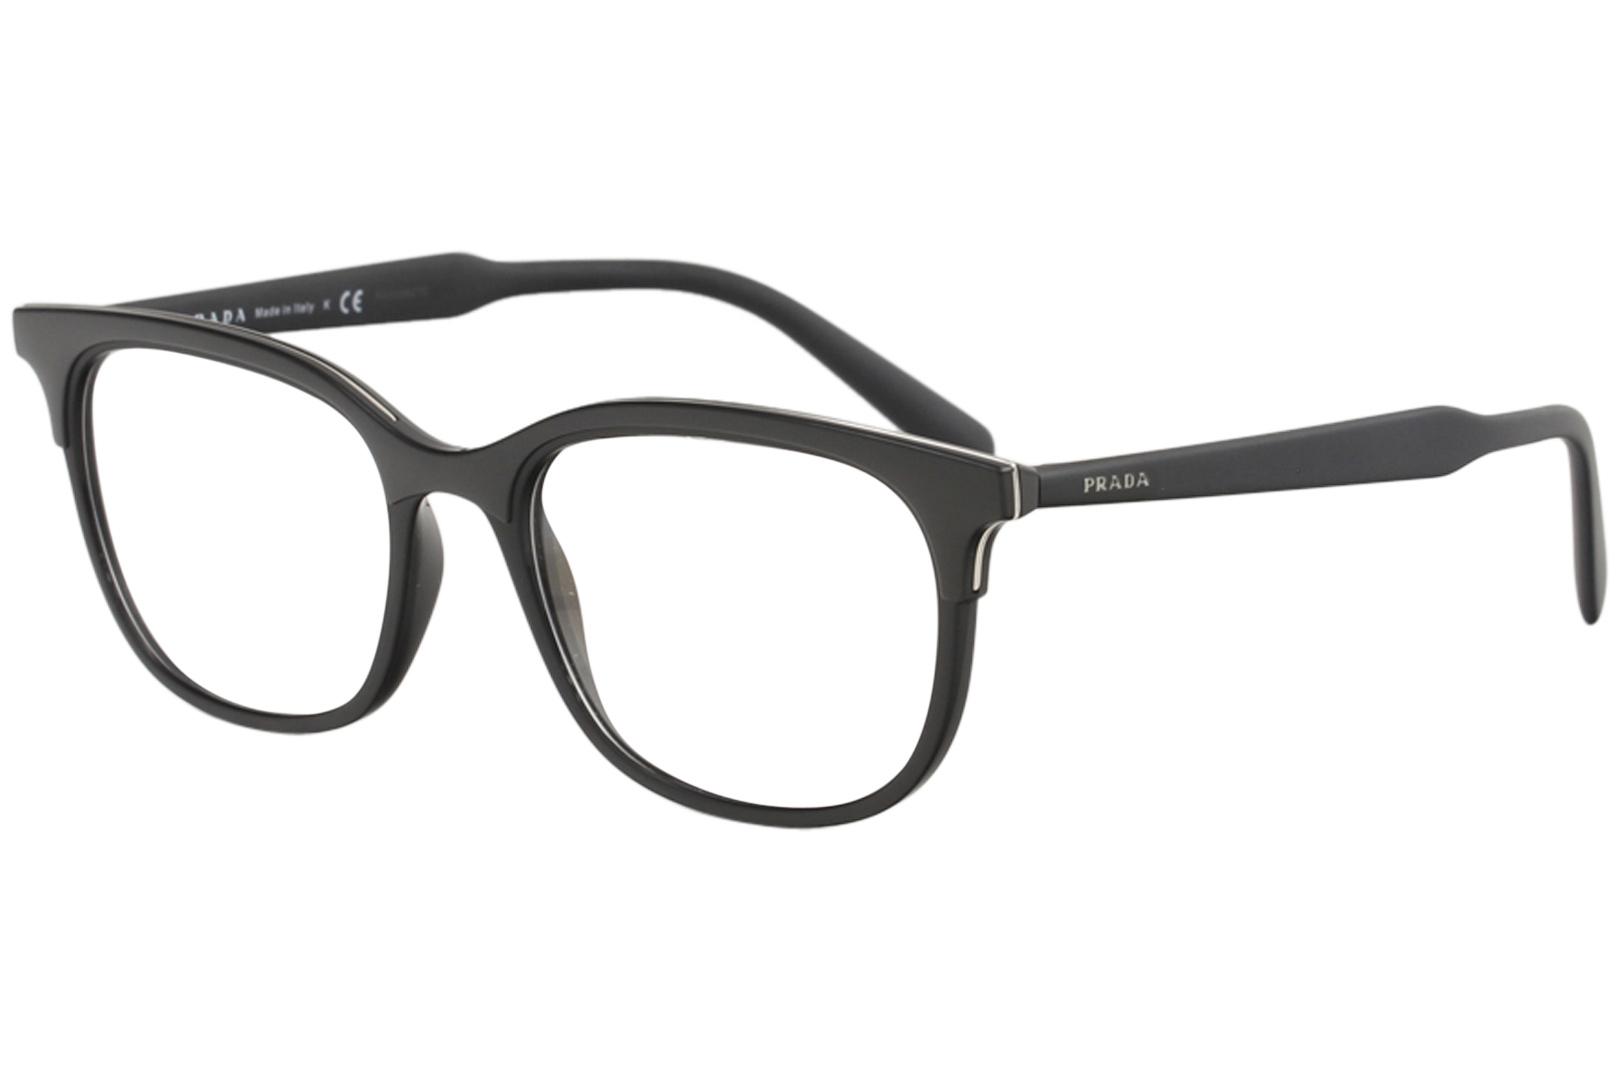 2d3e4ce04b Prada Men s Eyeglasses VPR05V VPR 05V 264 1O1 Black Full Rim Optical ...